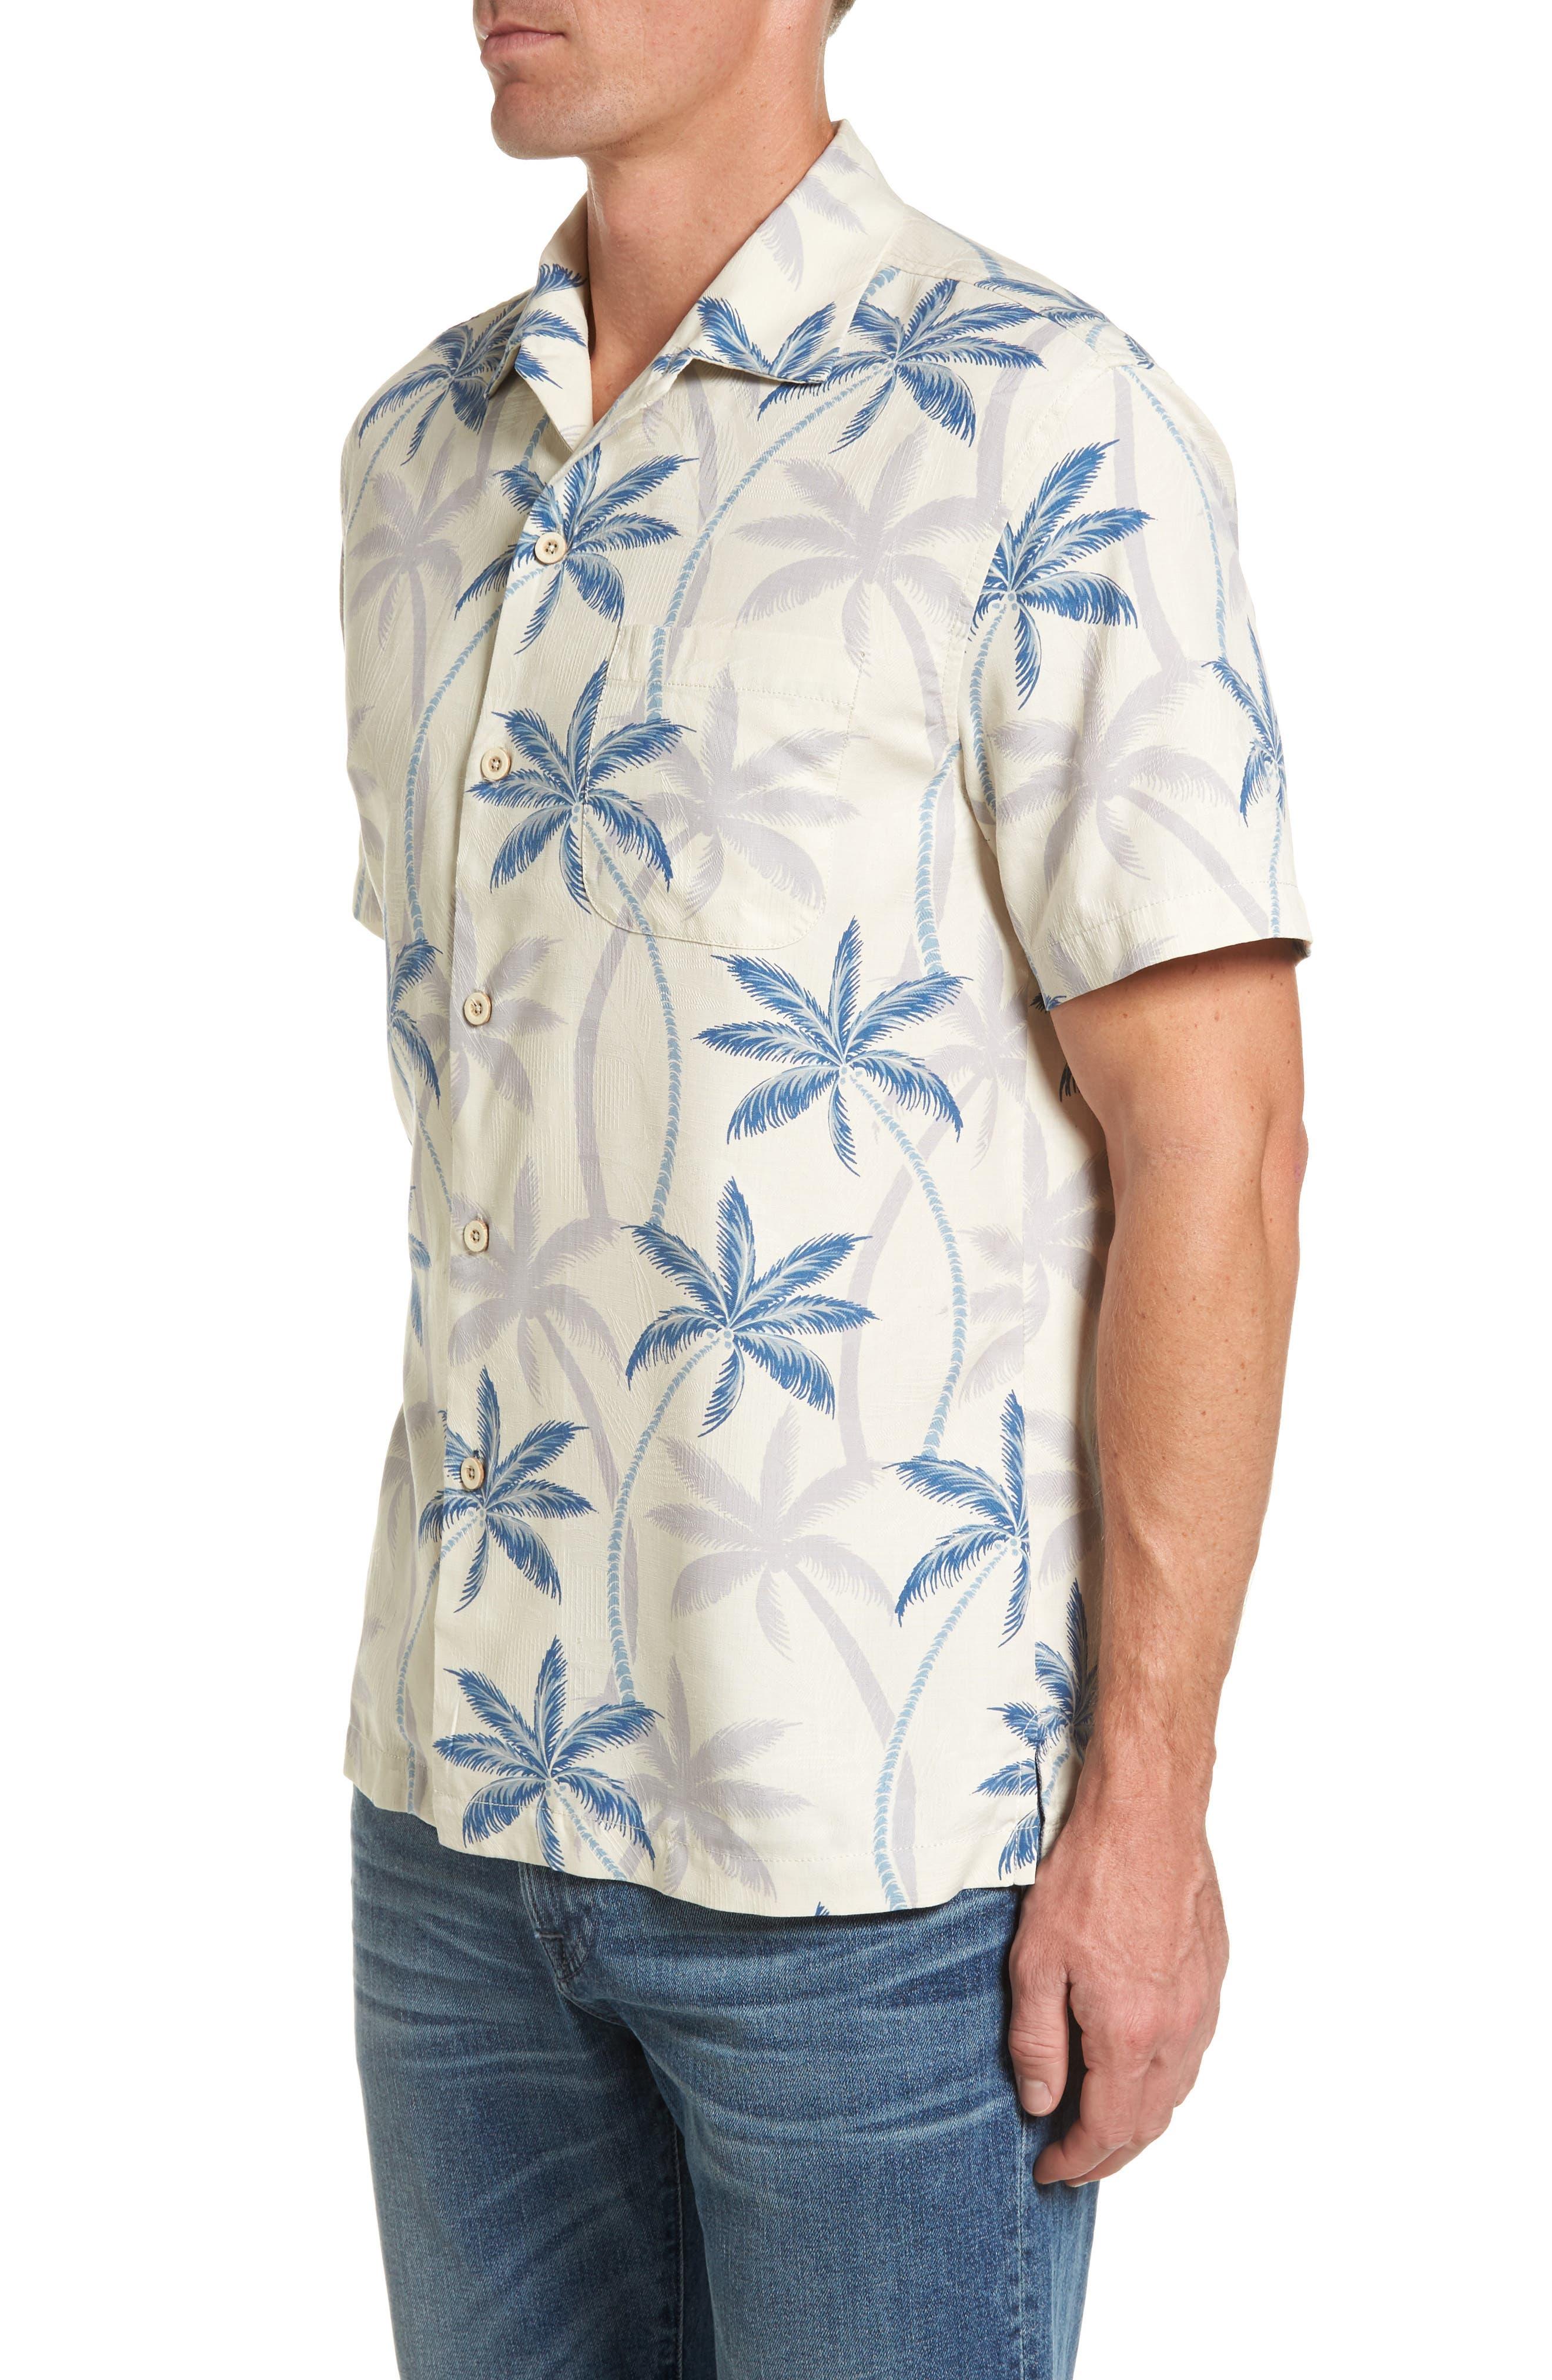 Palmas Palooza Woven Shirt,                             Alternate thumbnail 3, color,                             100